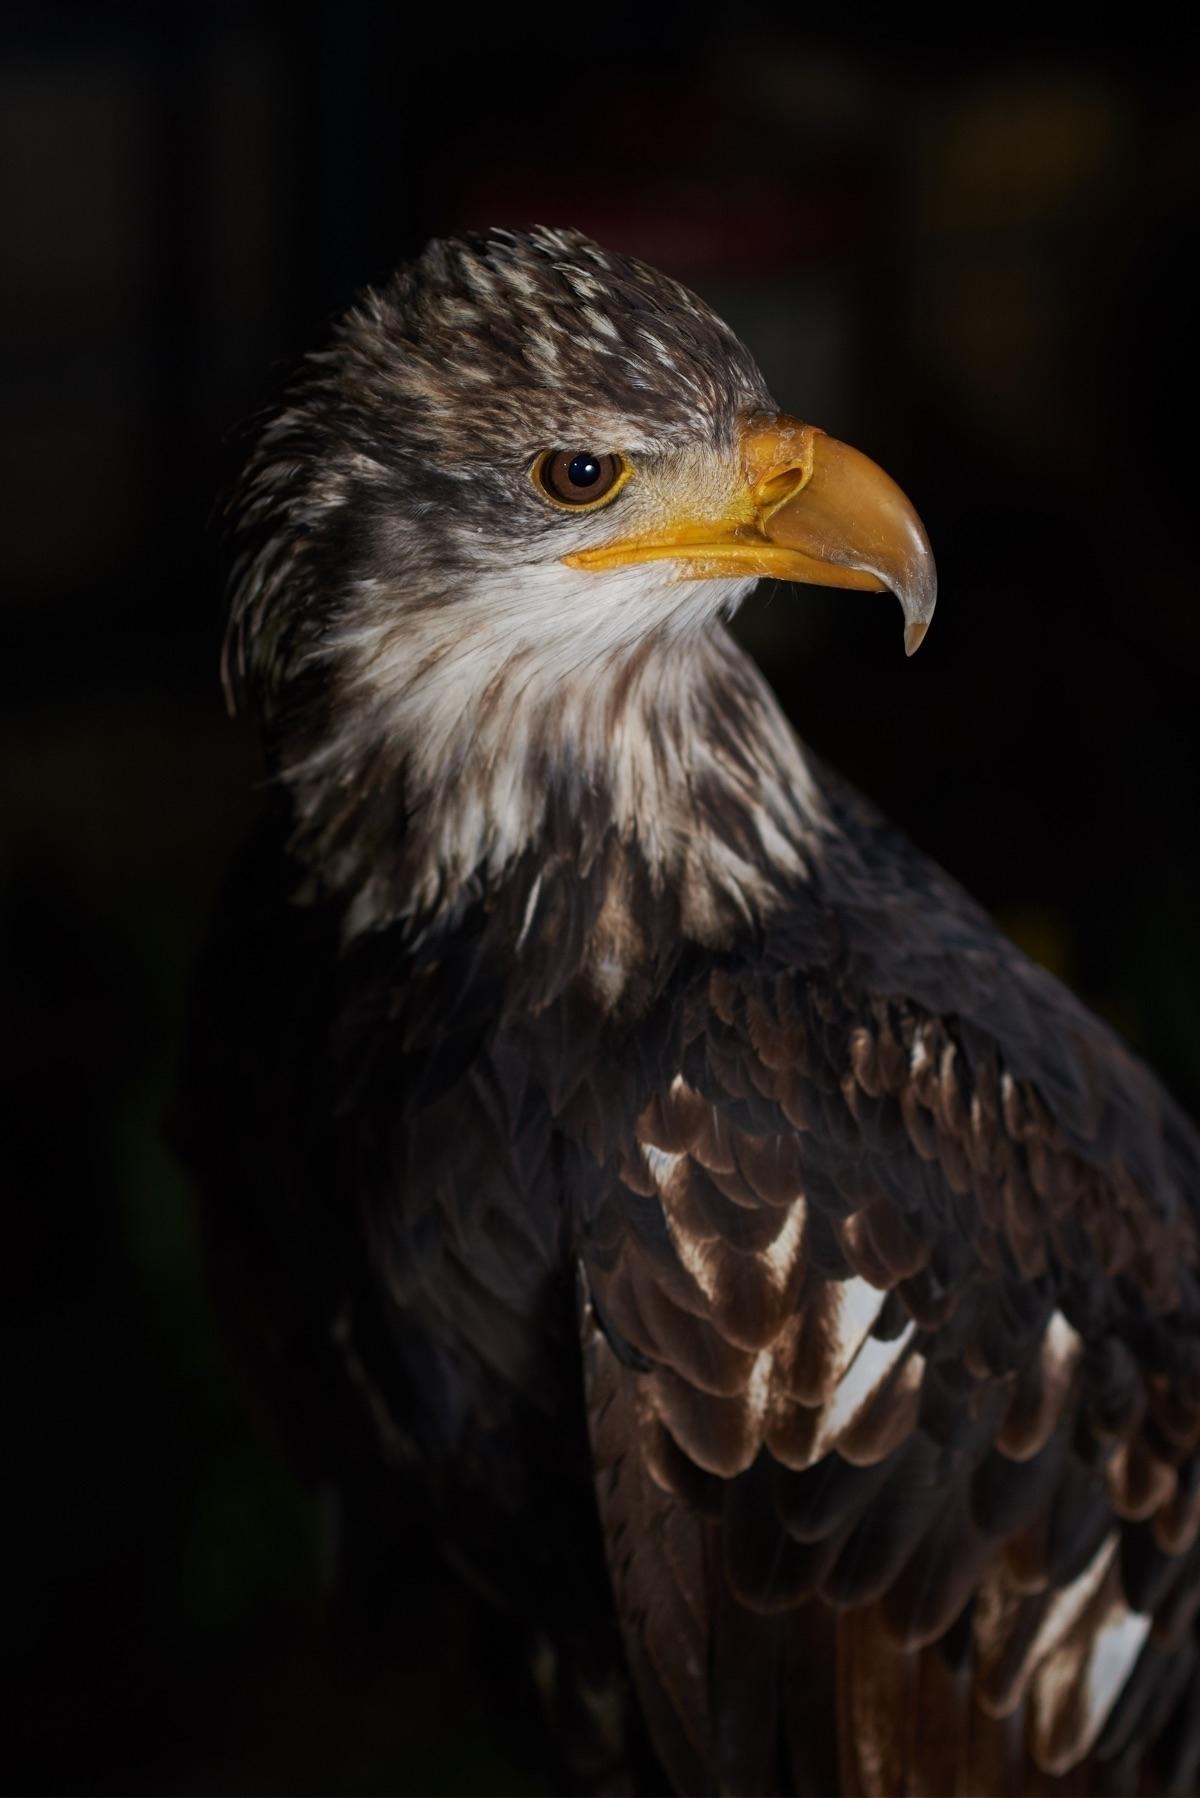 eagle, hss, d750, sb900, inmygarden - hello_wolf | ello